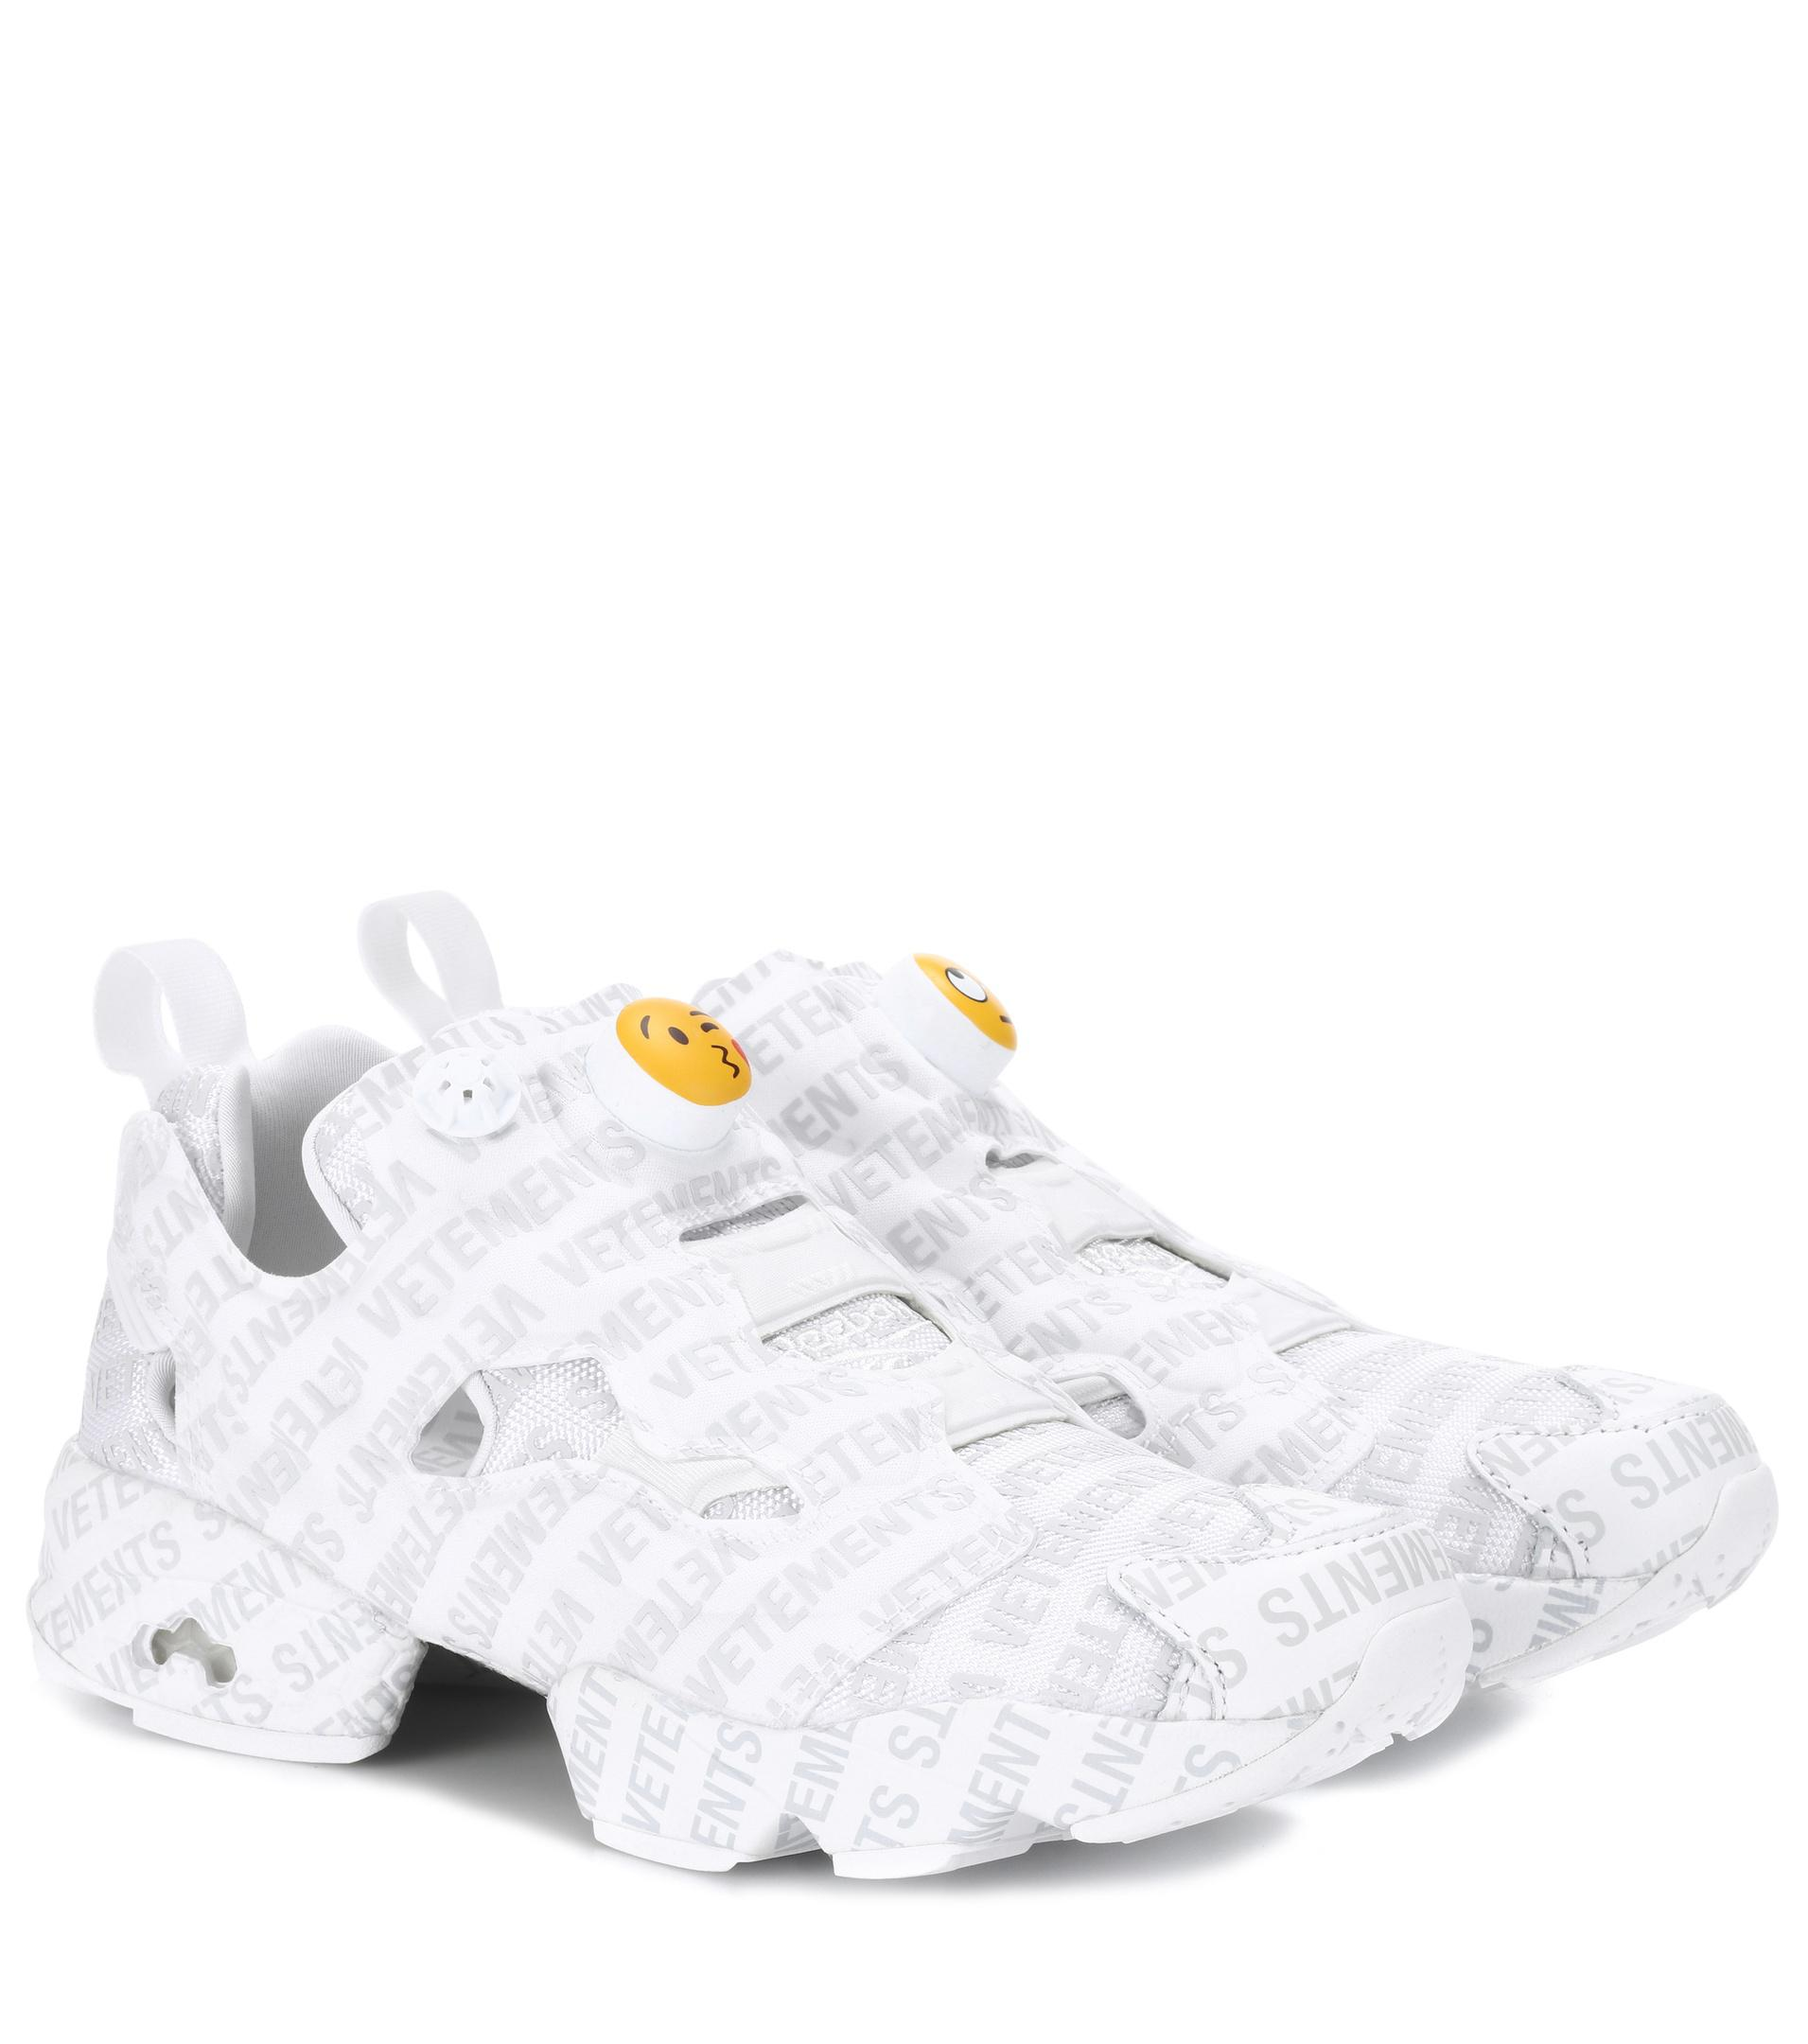 Sophia Webster White Reebok Classics Edition Logo Emoji Instapump Fury Sneakers h3aAz